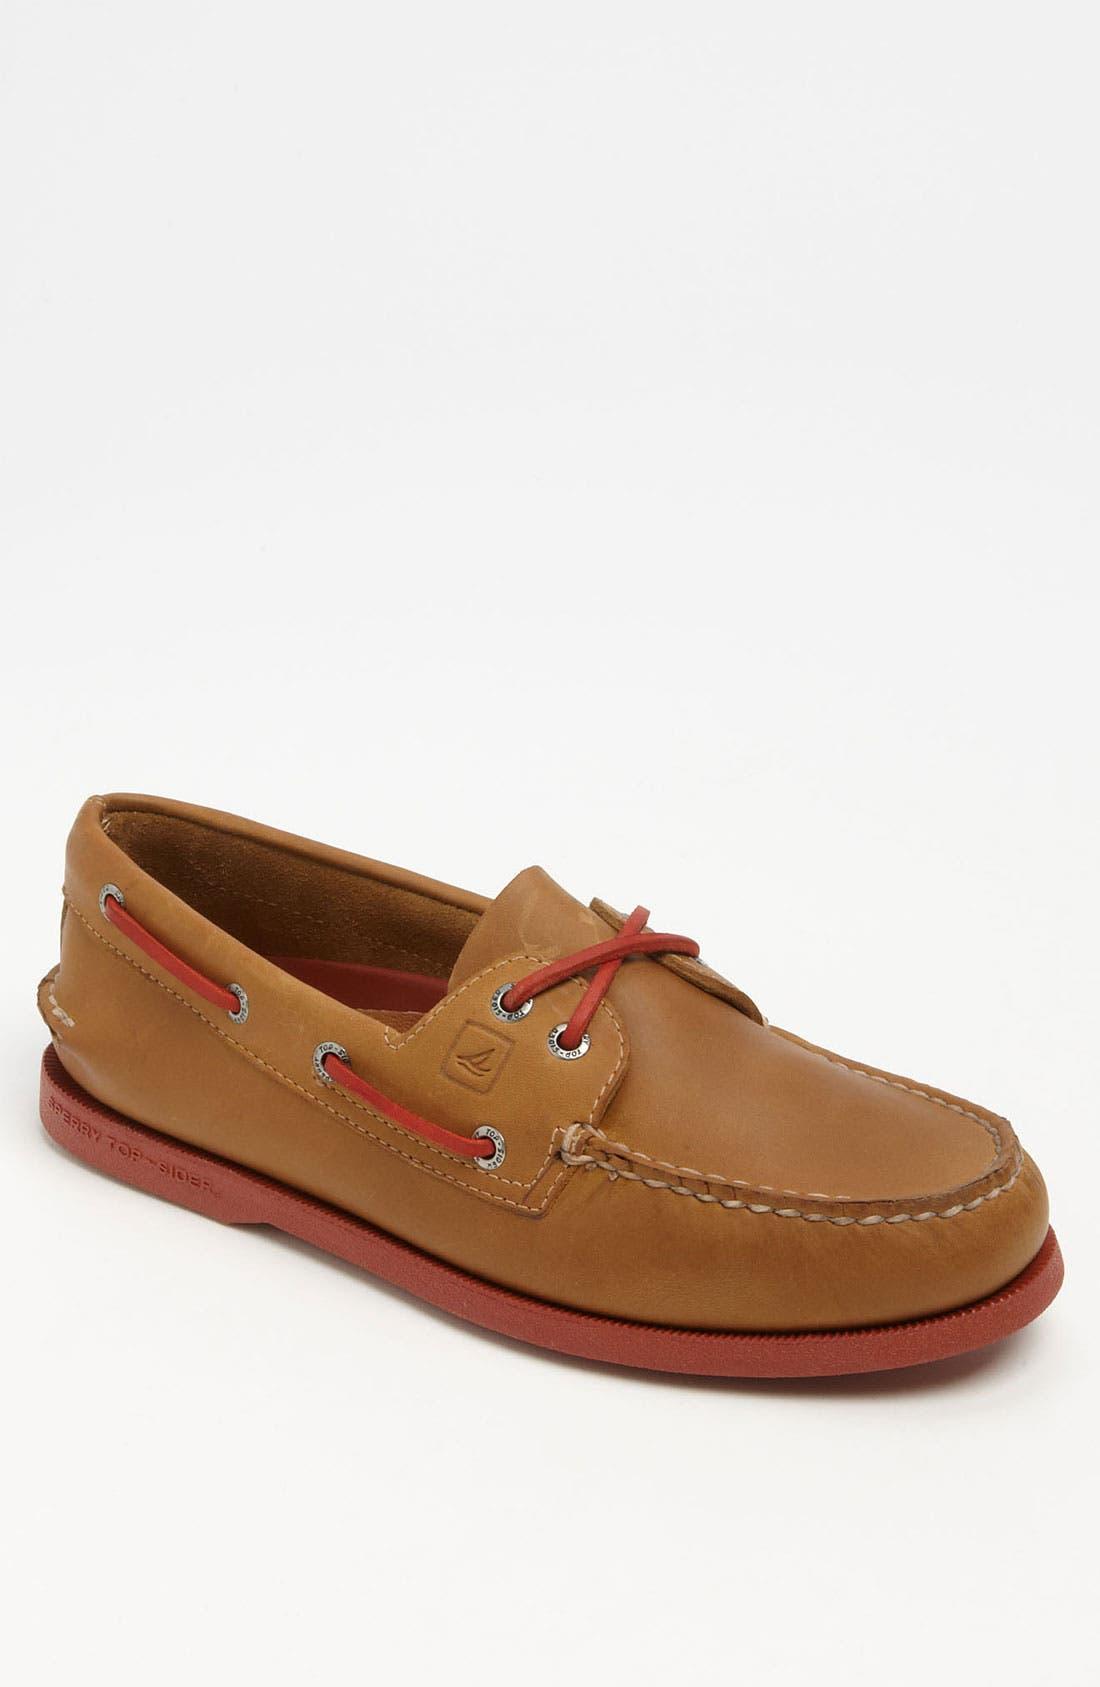 Main Image - Sperry Top-Sider® 'Authentic Original 2-Eye' Boat Shoe (Regular Retail Price: $89.95)